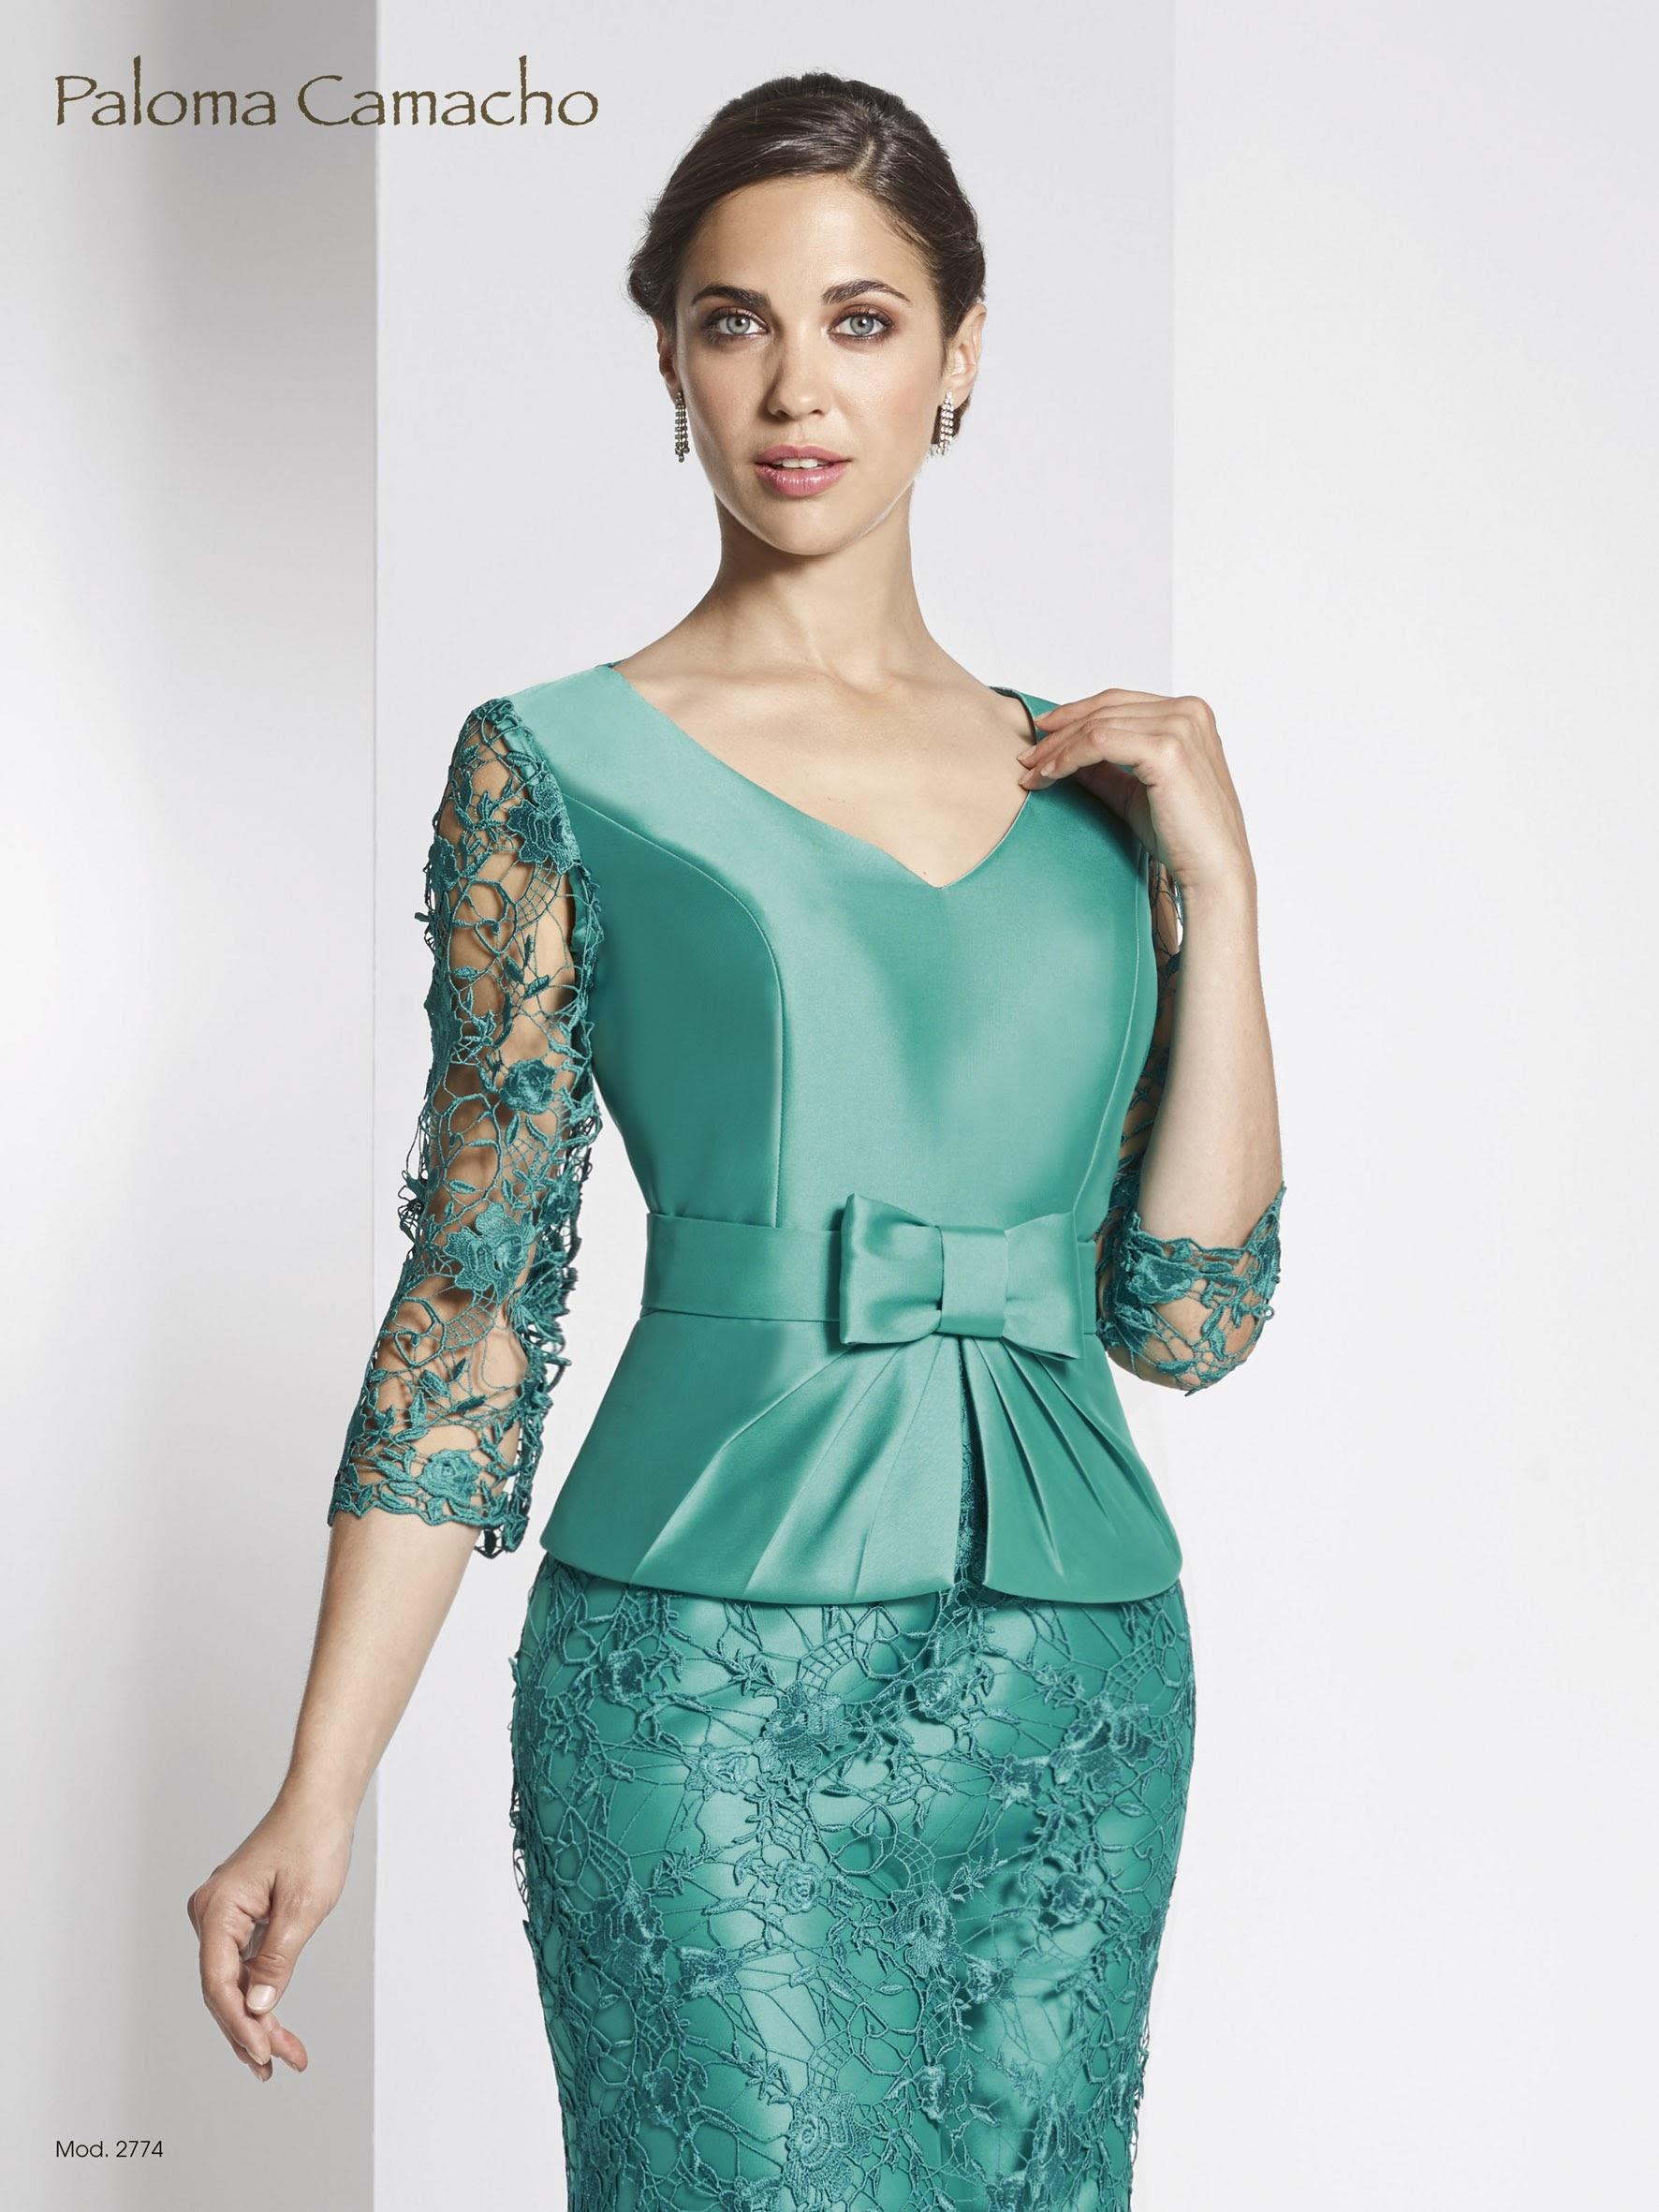 Vestido Paloma Camacho 2774 - penhalta